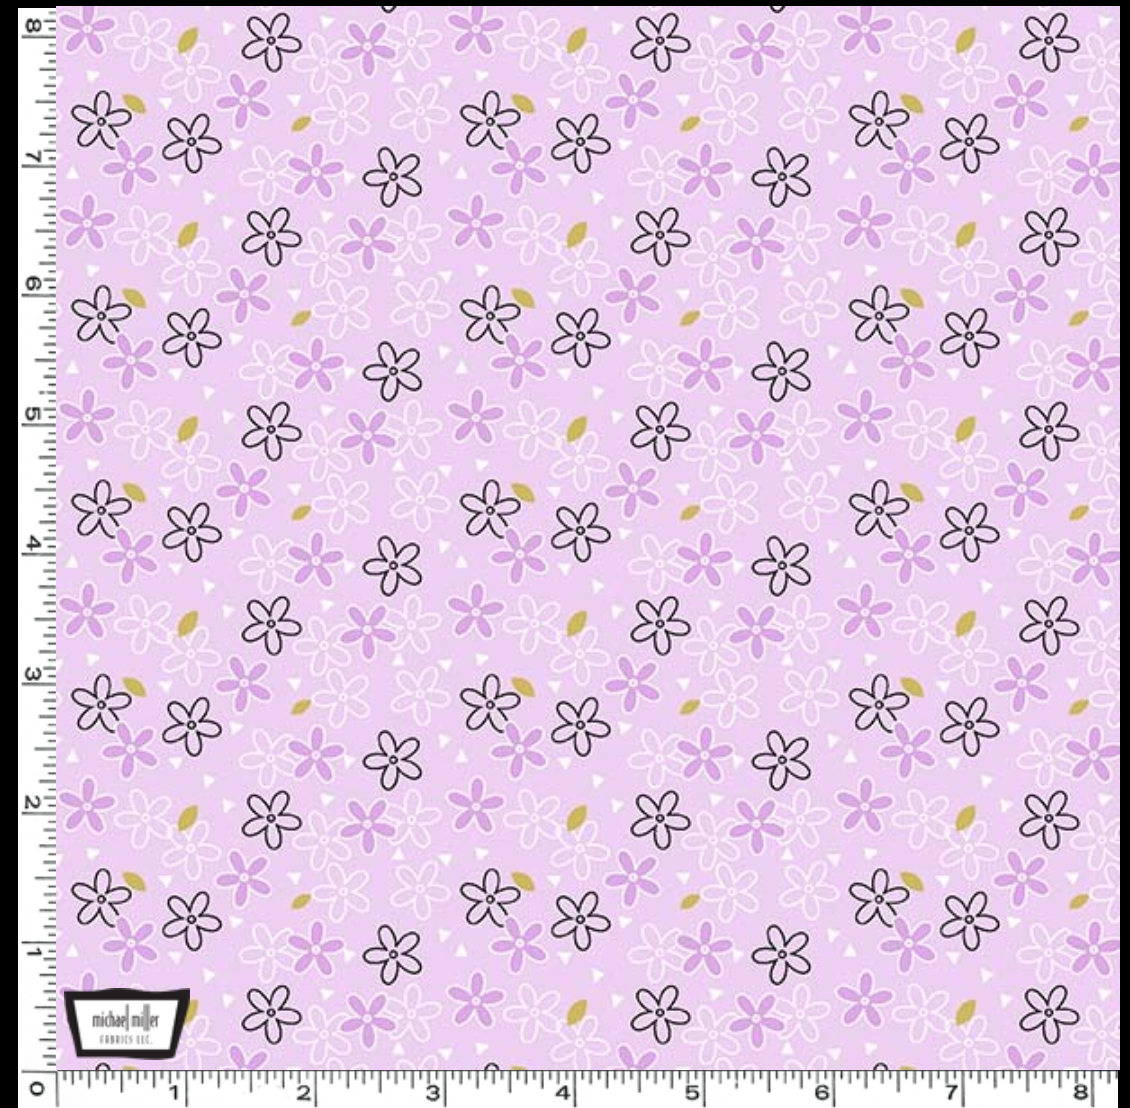 Glitter Daisy designed by Sandra Clemons for Michael Miller Fabrics lavender floral fabric